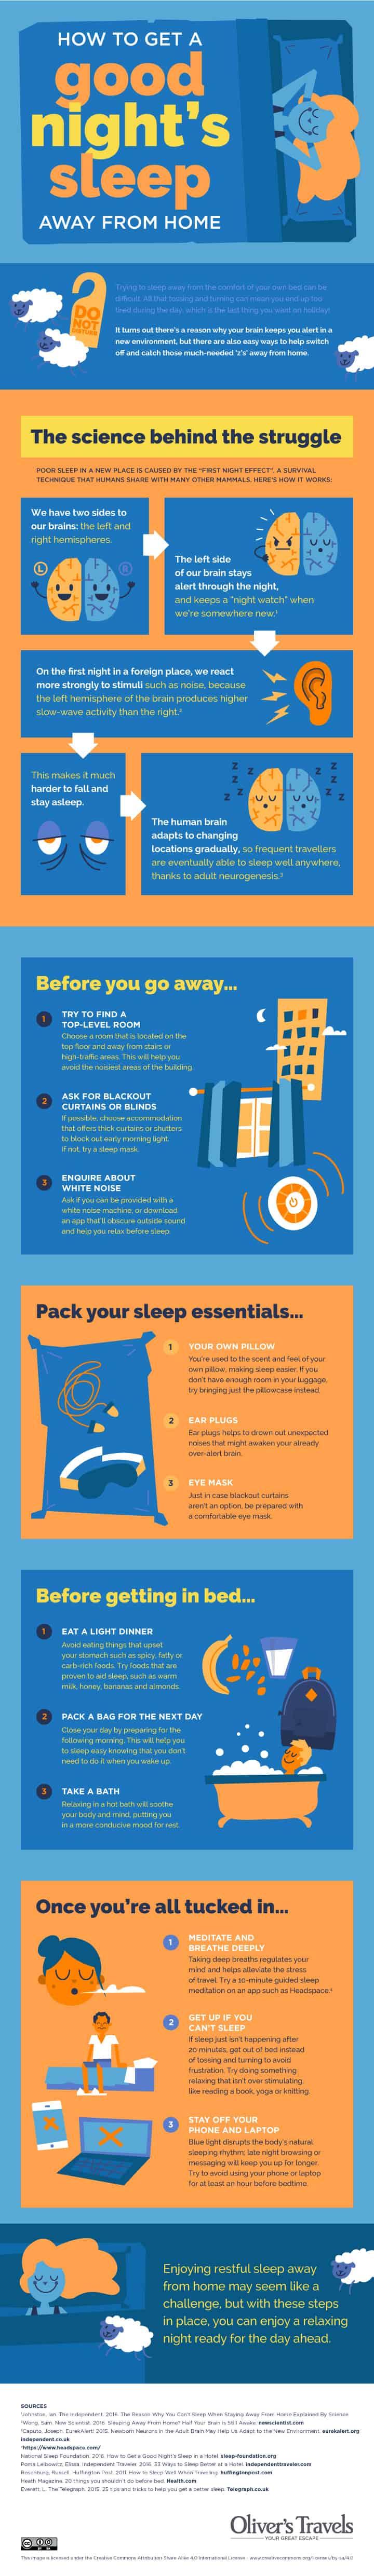 to get good sleep